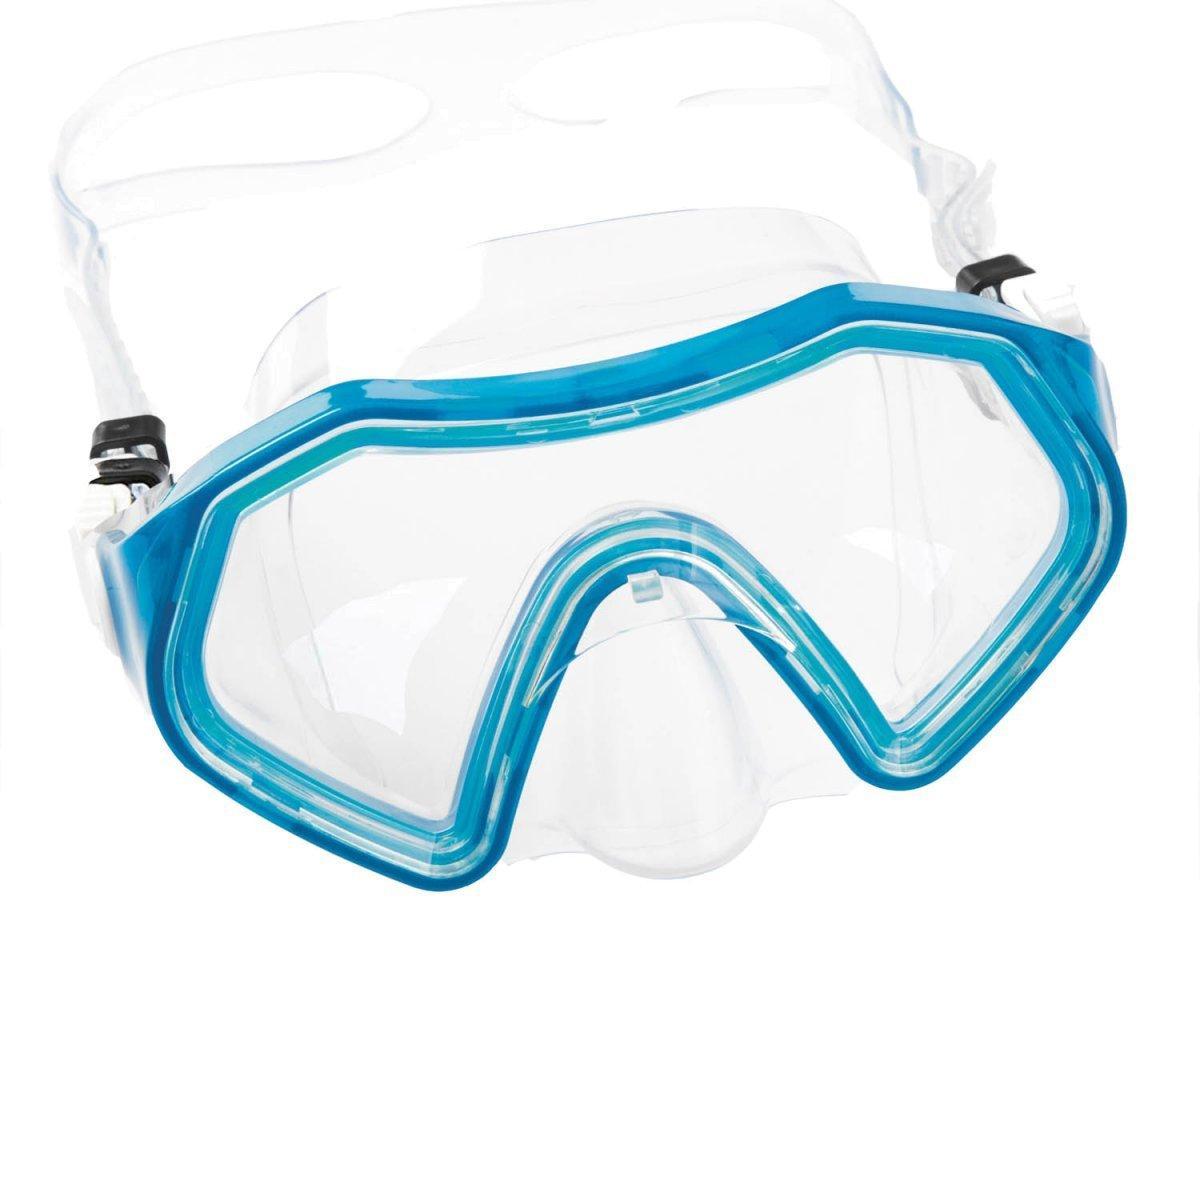 Маска для плавания Bestway 22049, размер M (6+), обхват головы ≈ 52 см, синяя